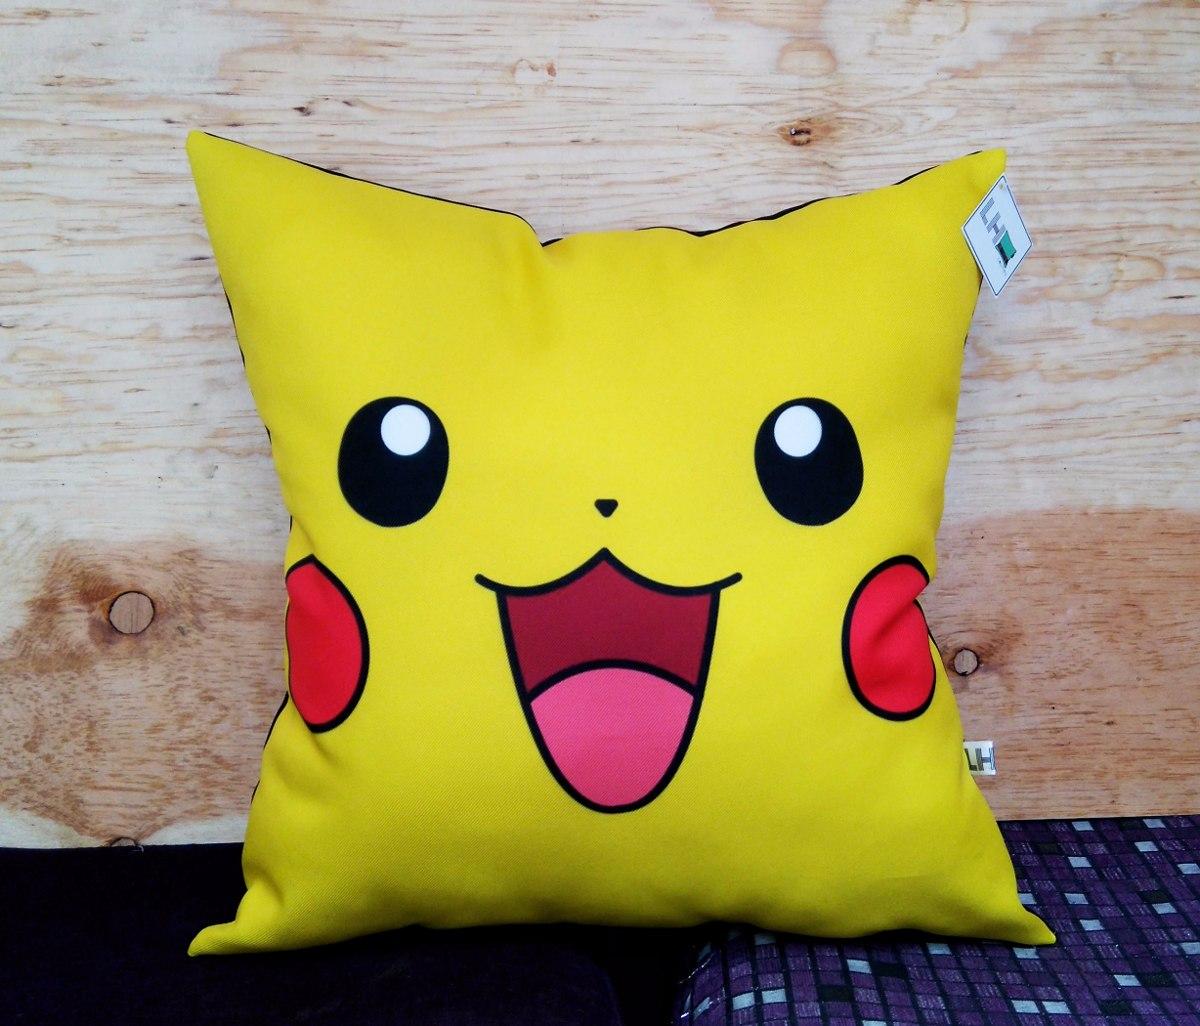 Coj N Pikachu Pokemon Cara Caricatura Regalo O Decoraci N  # Muebles Pokemon Mercadolibre